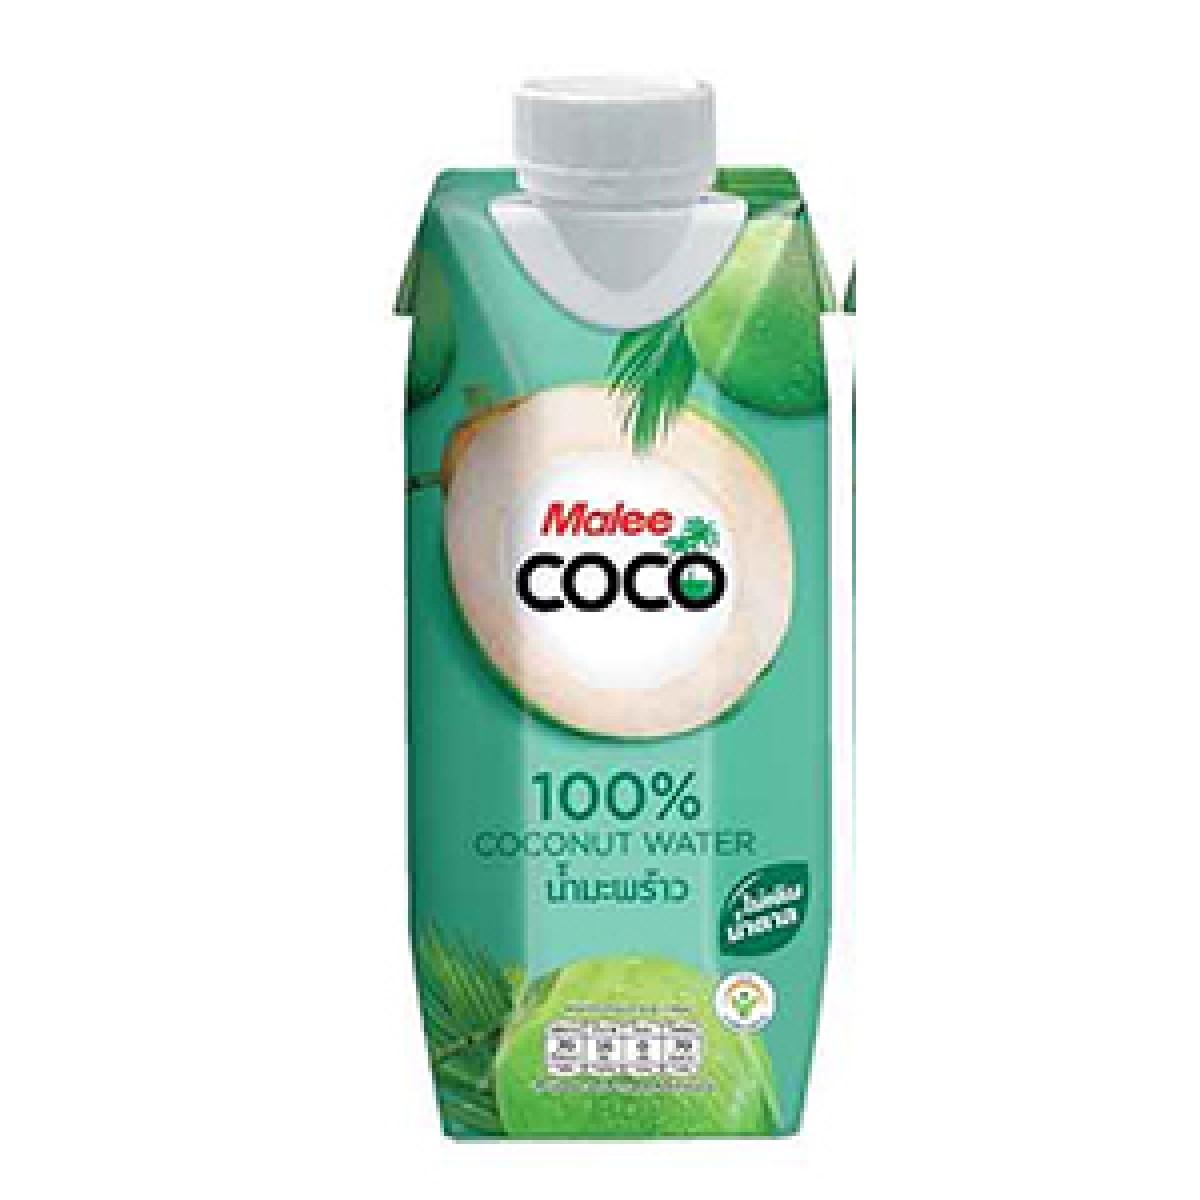 (MALEE COCO) 100% COCONUT WATER 330ML - Kanpeki